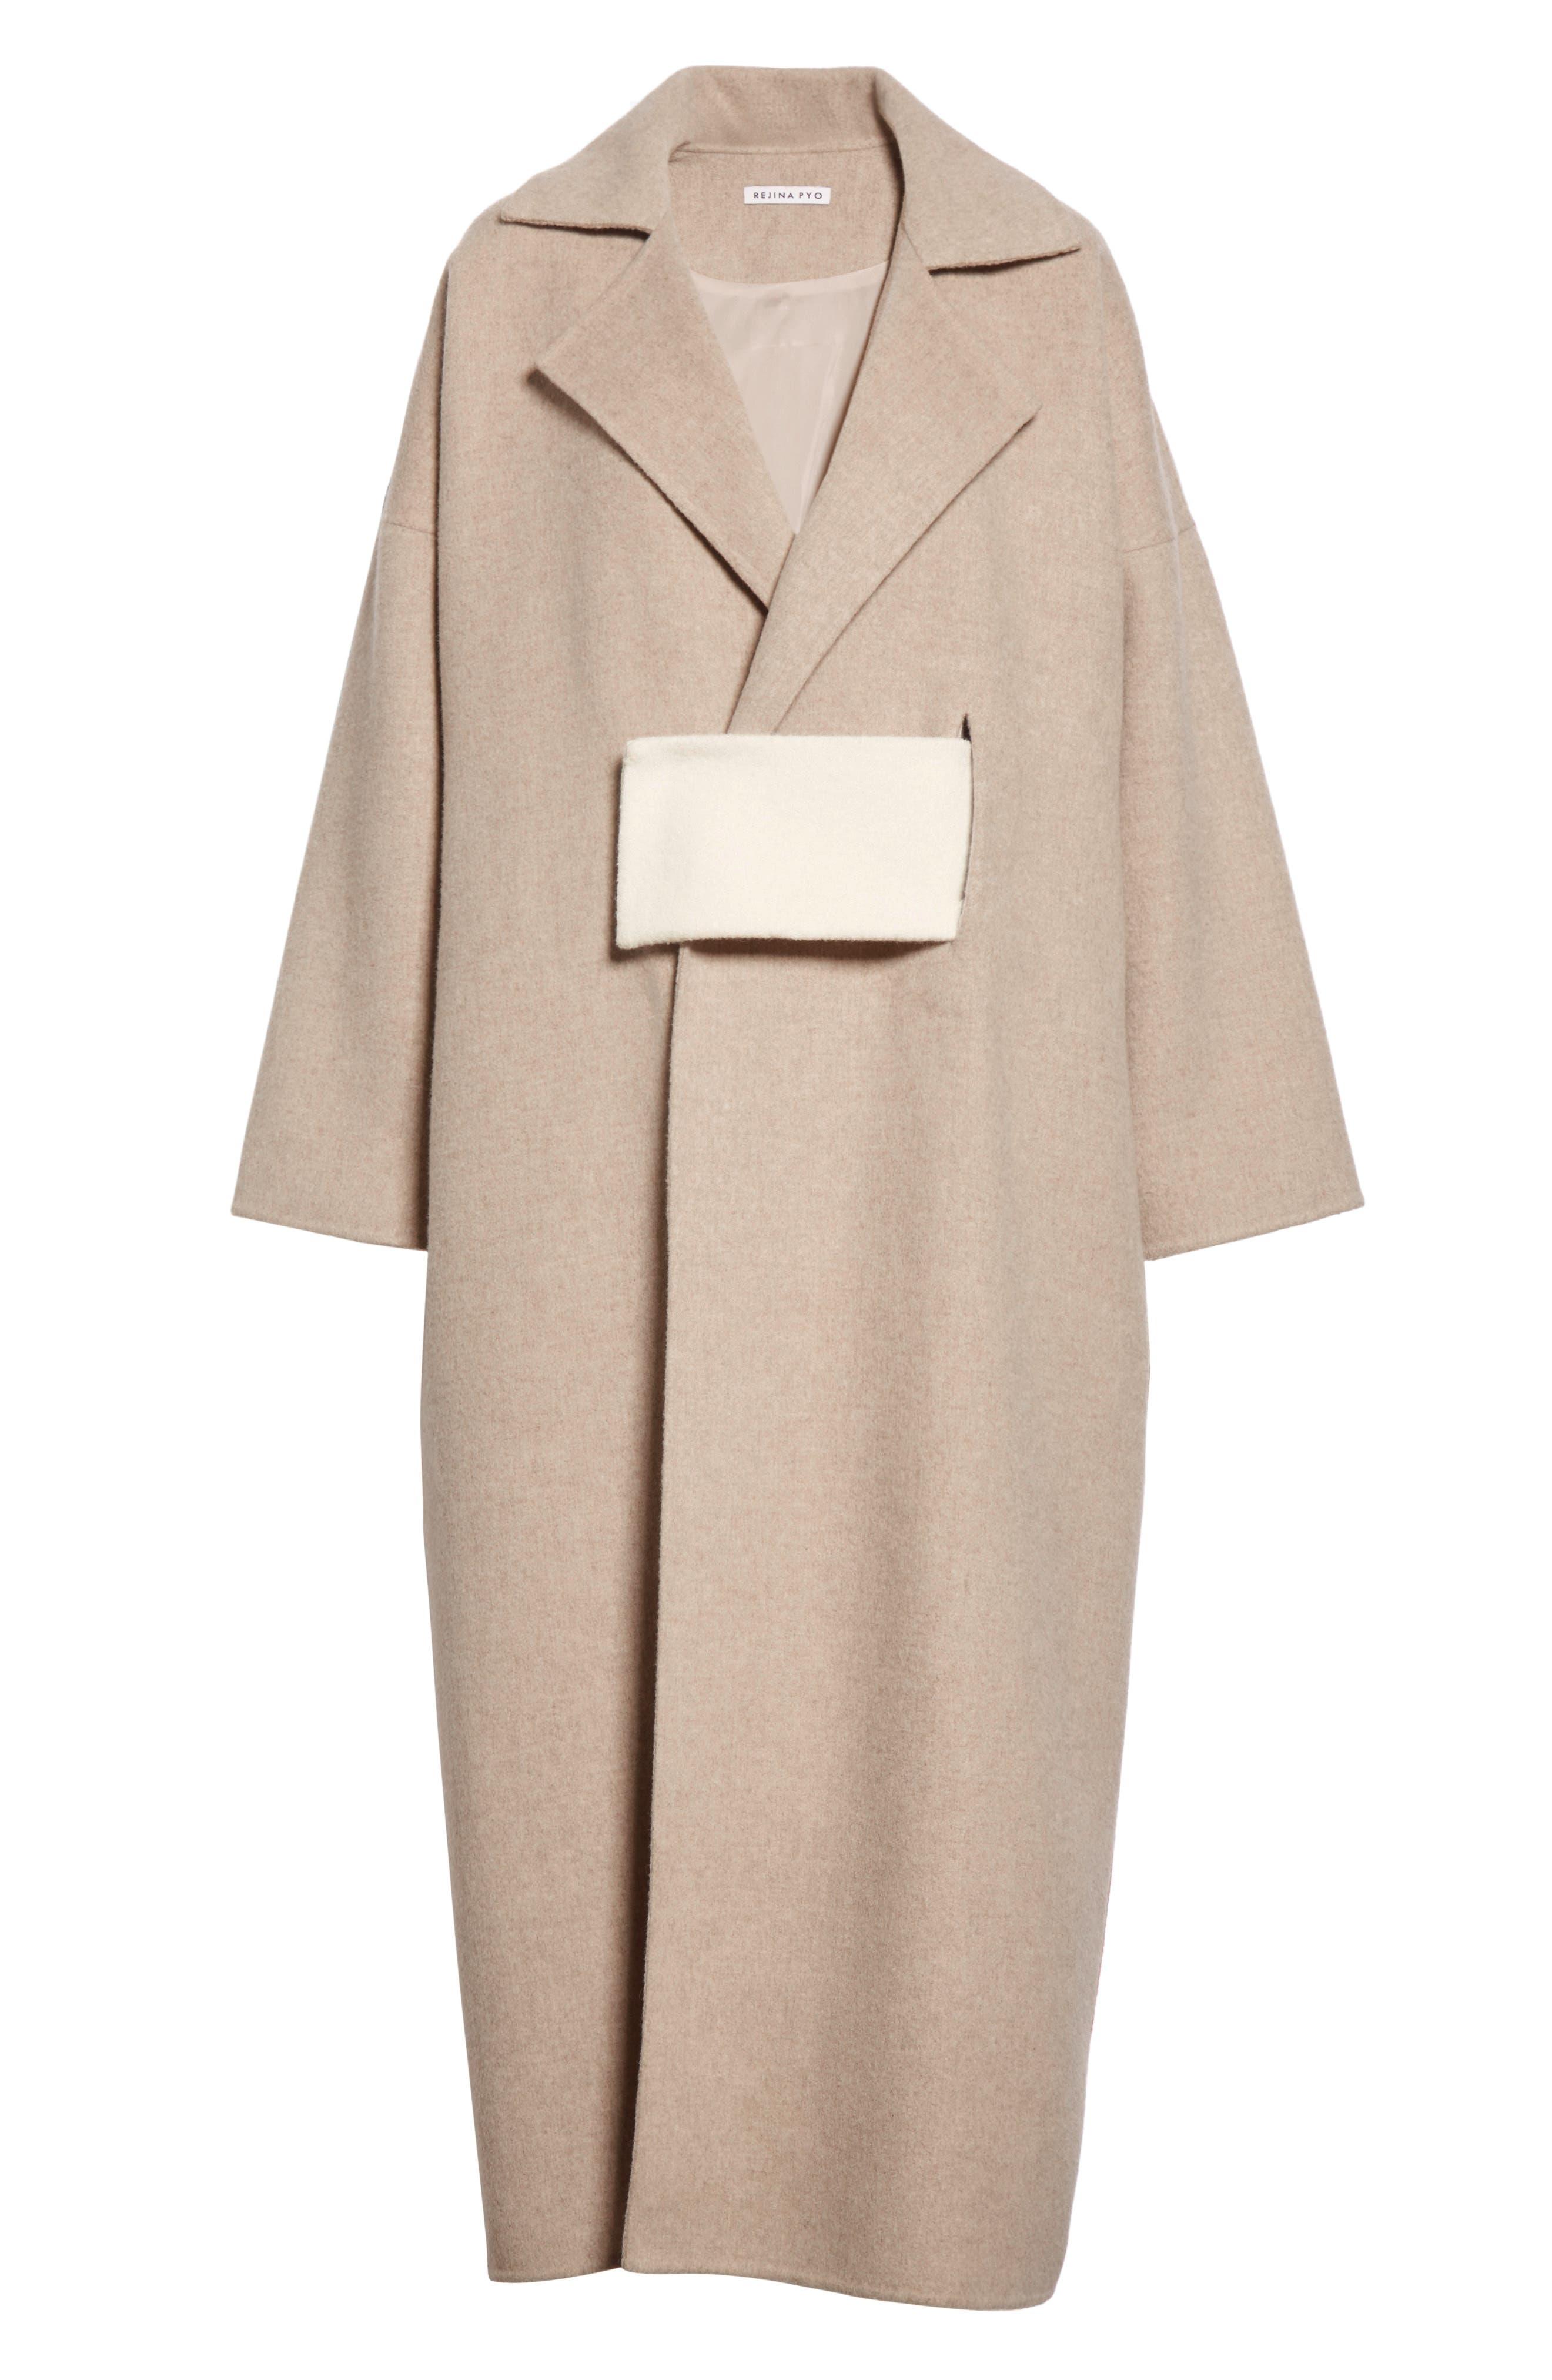 Kate Oversize Belted Coat,                             Alternate thumbnail 5, color,                             260